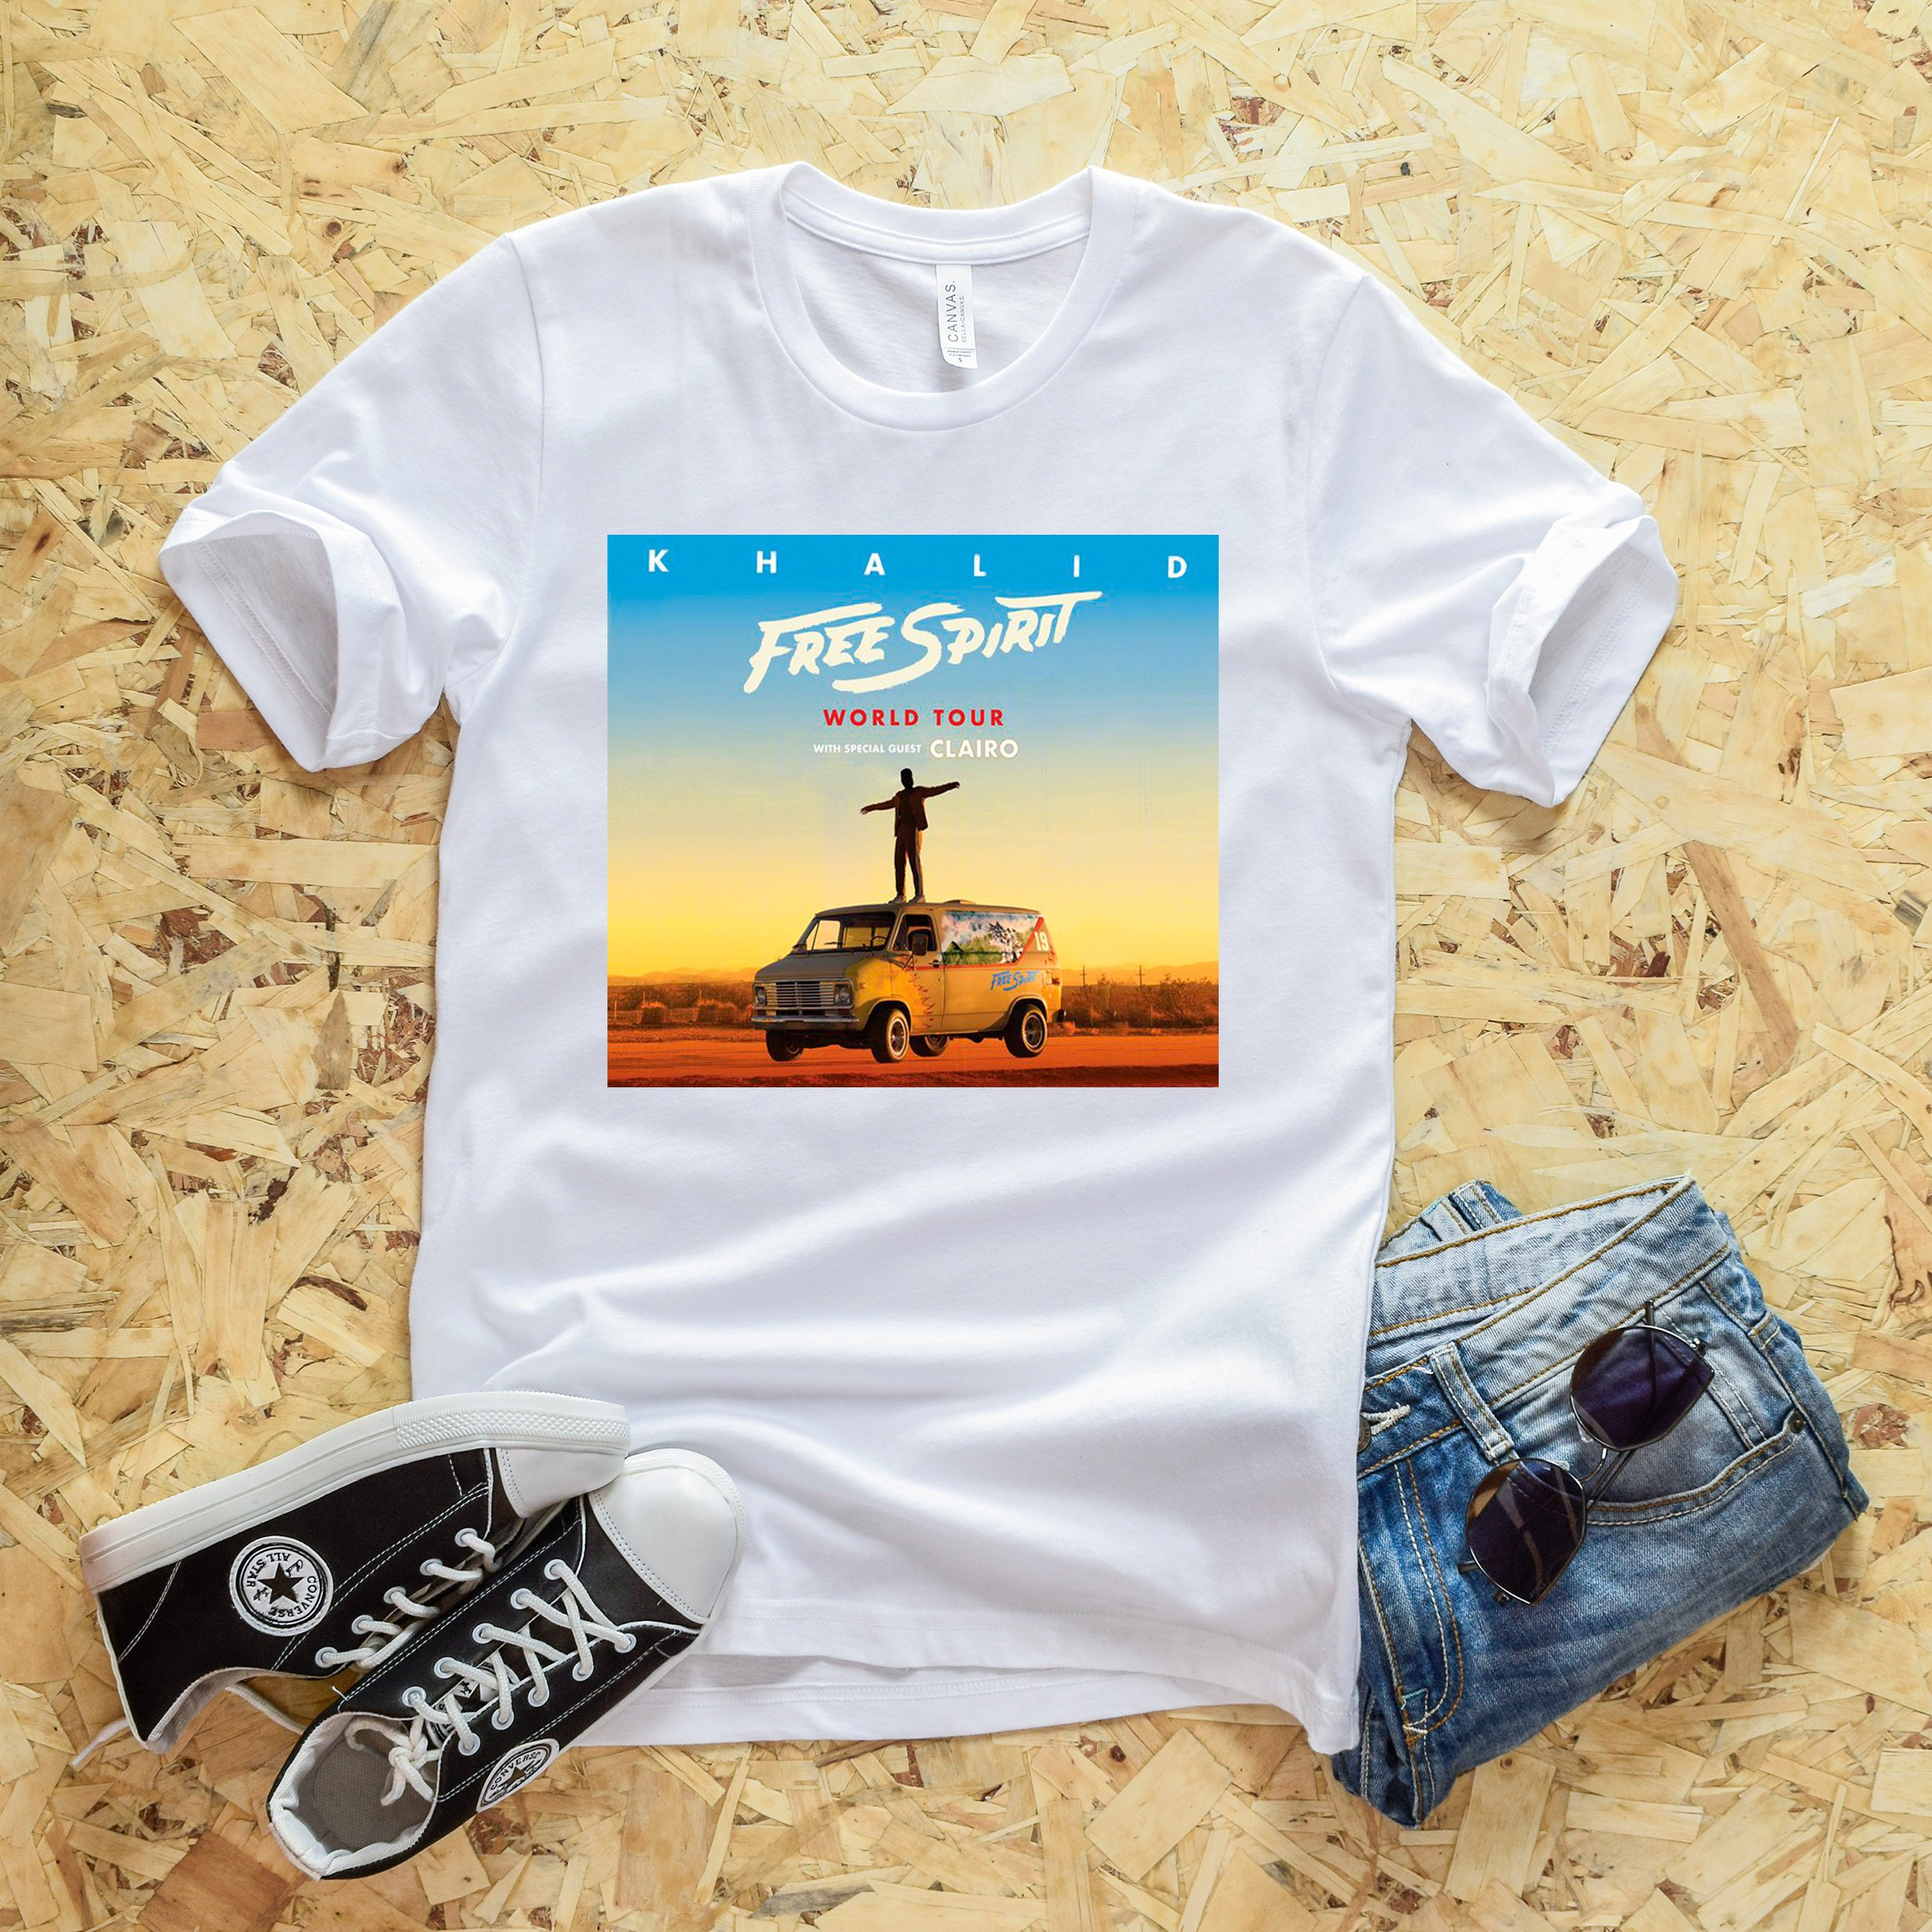 2019 New Arrived Khalid Free Spirit World Tour Unisex T-Shirt Females Hip-hop Graphic Funny  Womens Holiday Short Sleeve Shirts